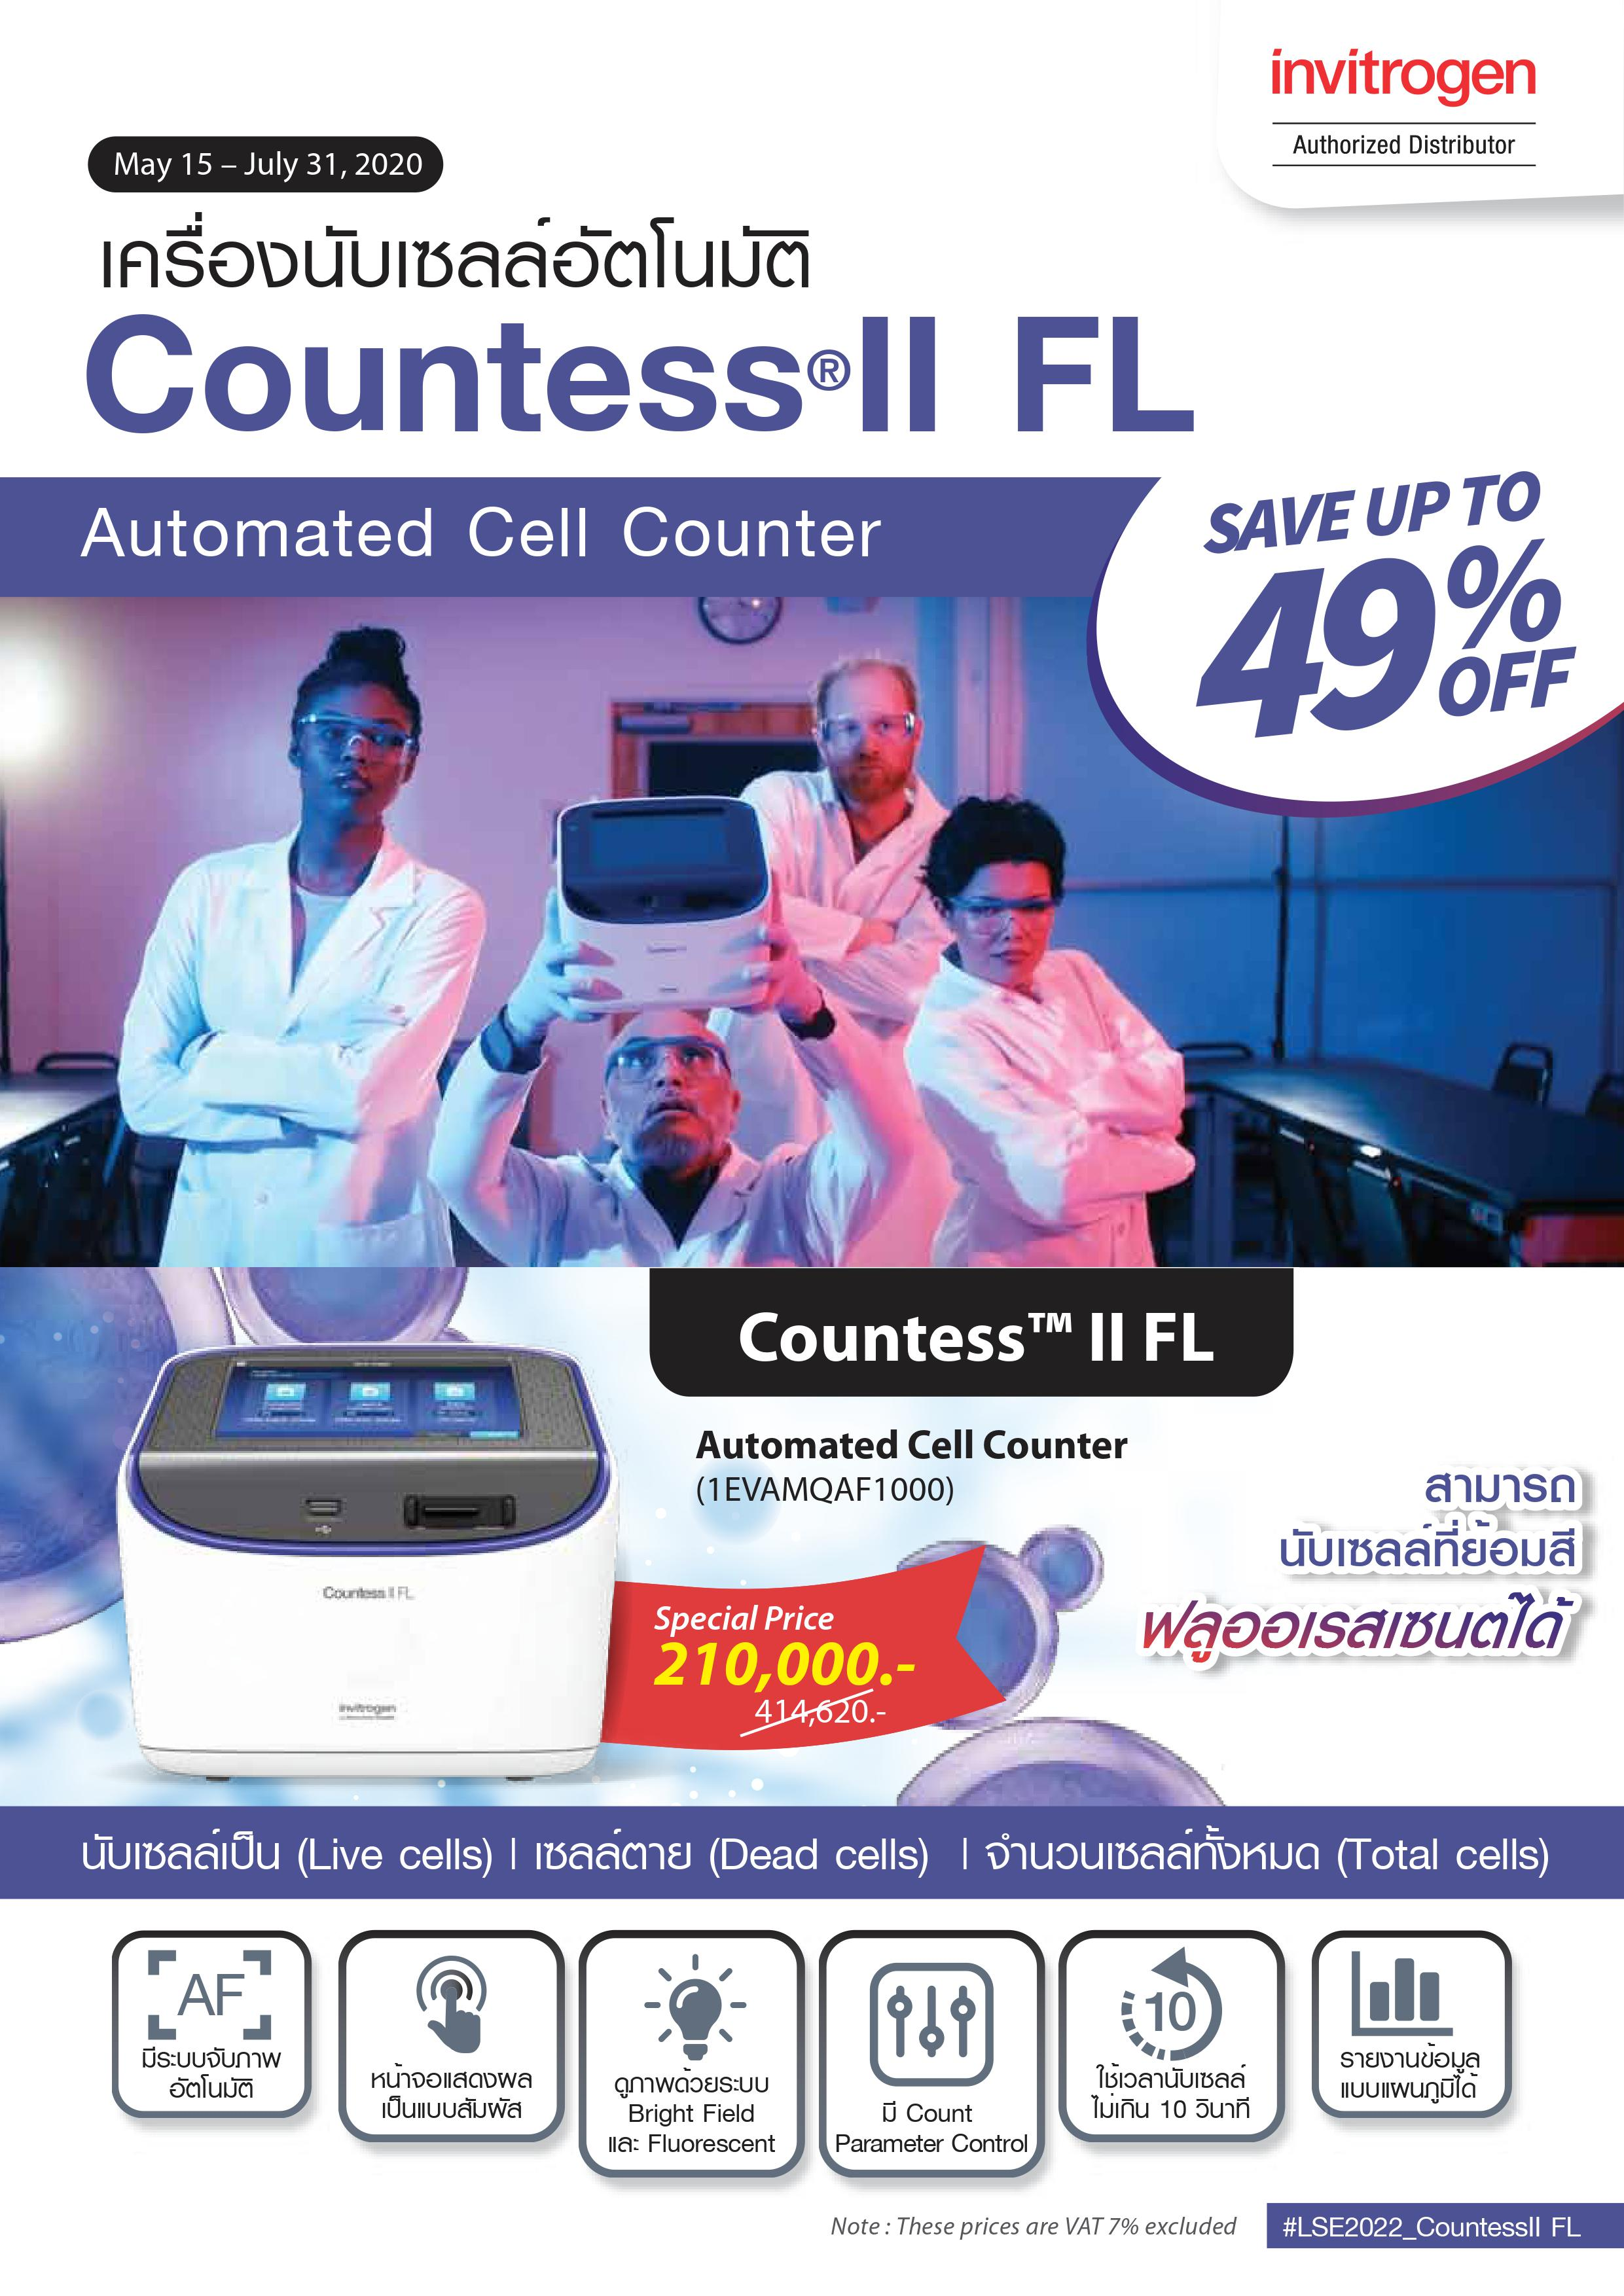 Countess II FL : เครื่องนับเซลล์อัตโนมัติ